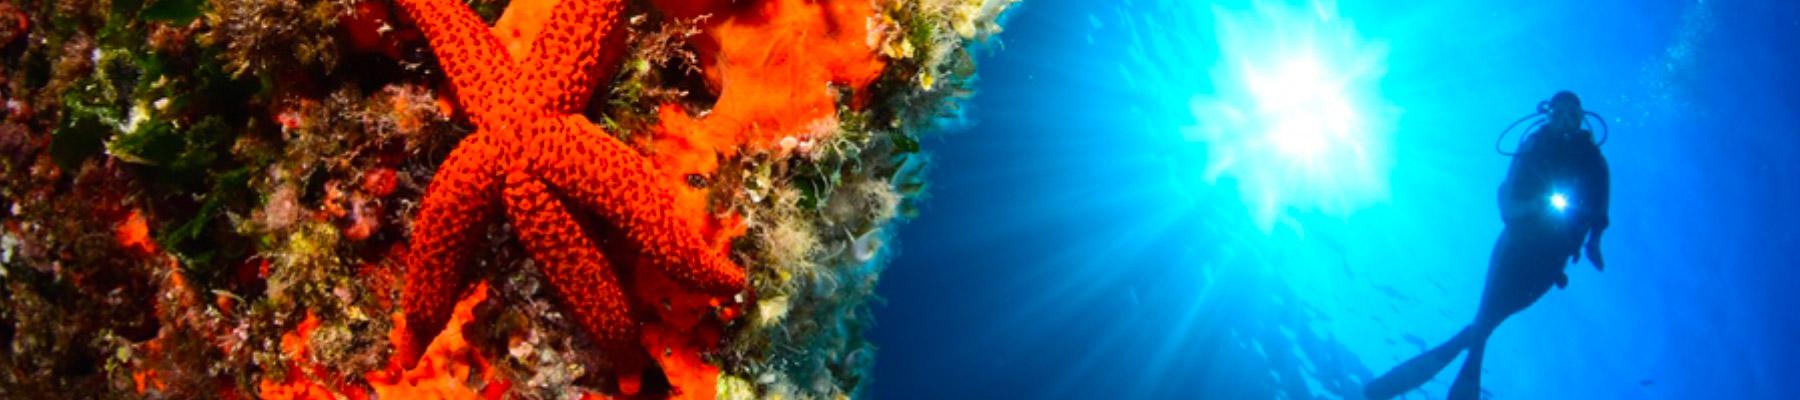 banniere-stage-photo-sous-marine-stephane-regnier